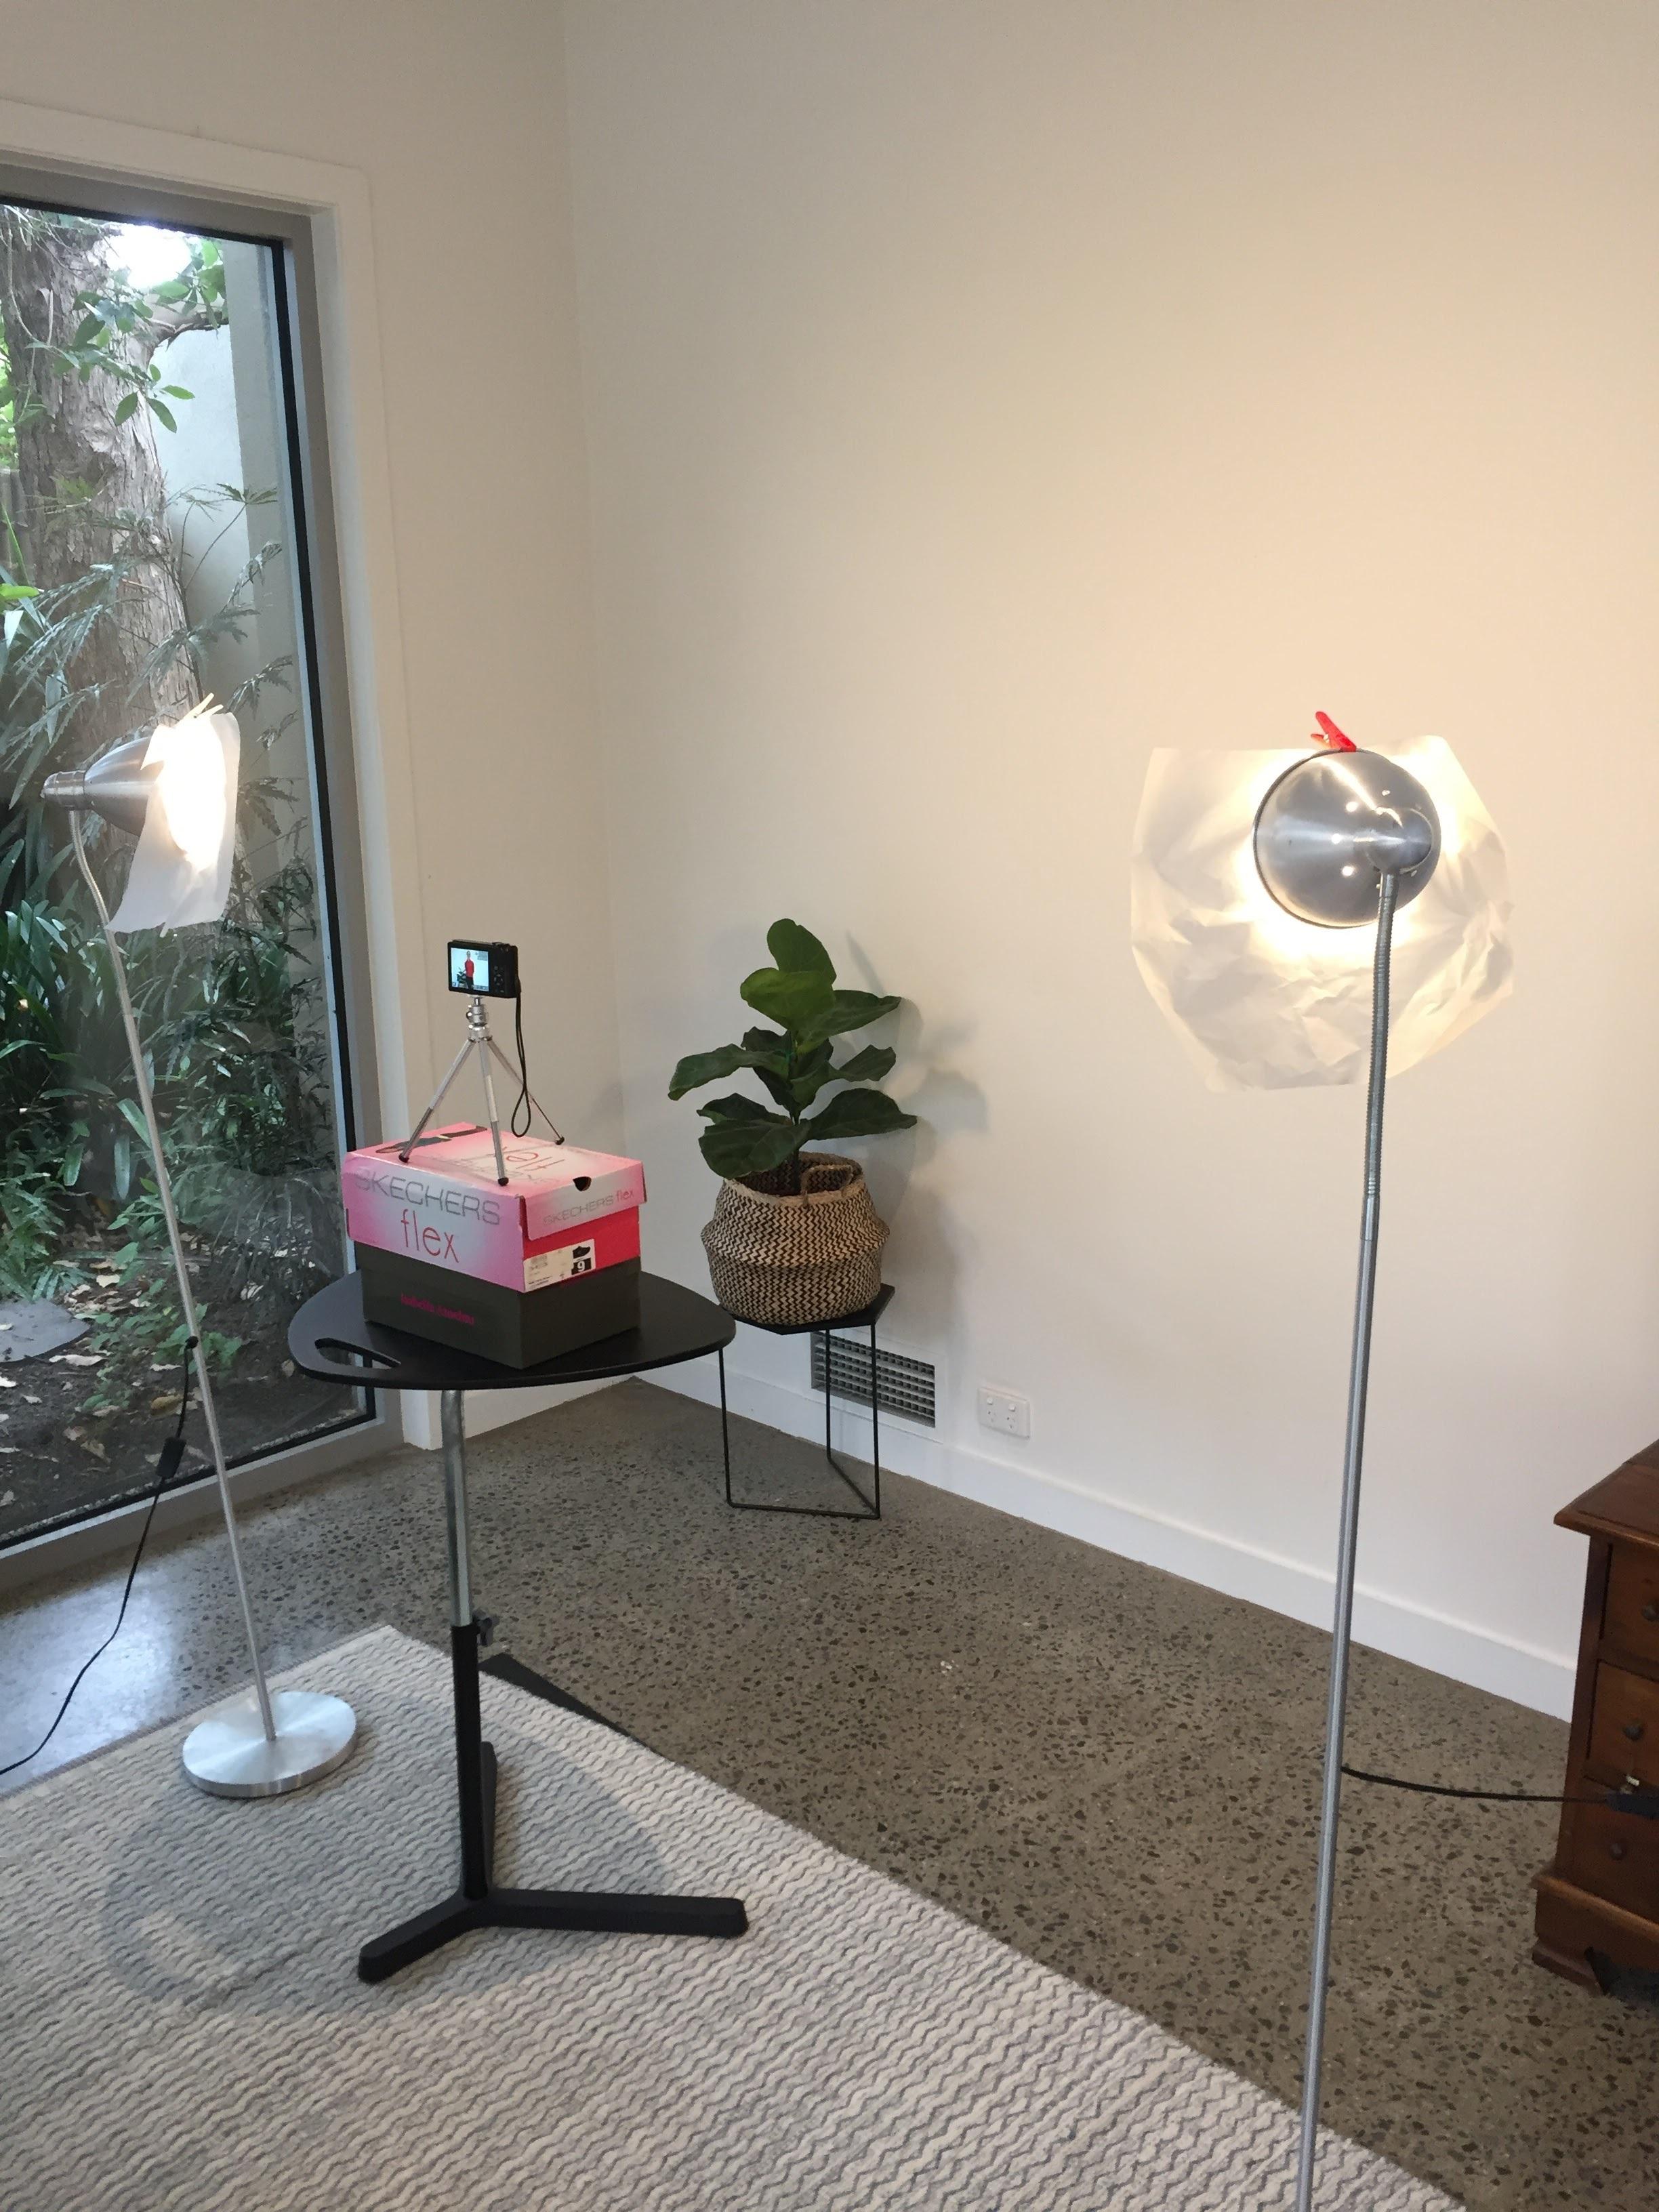 DIY lighting for photography